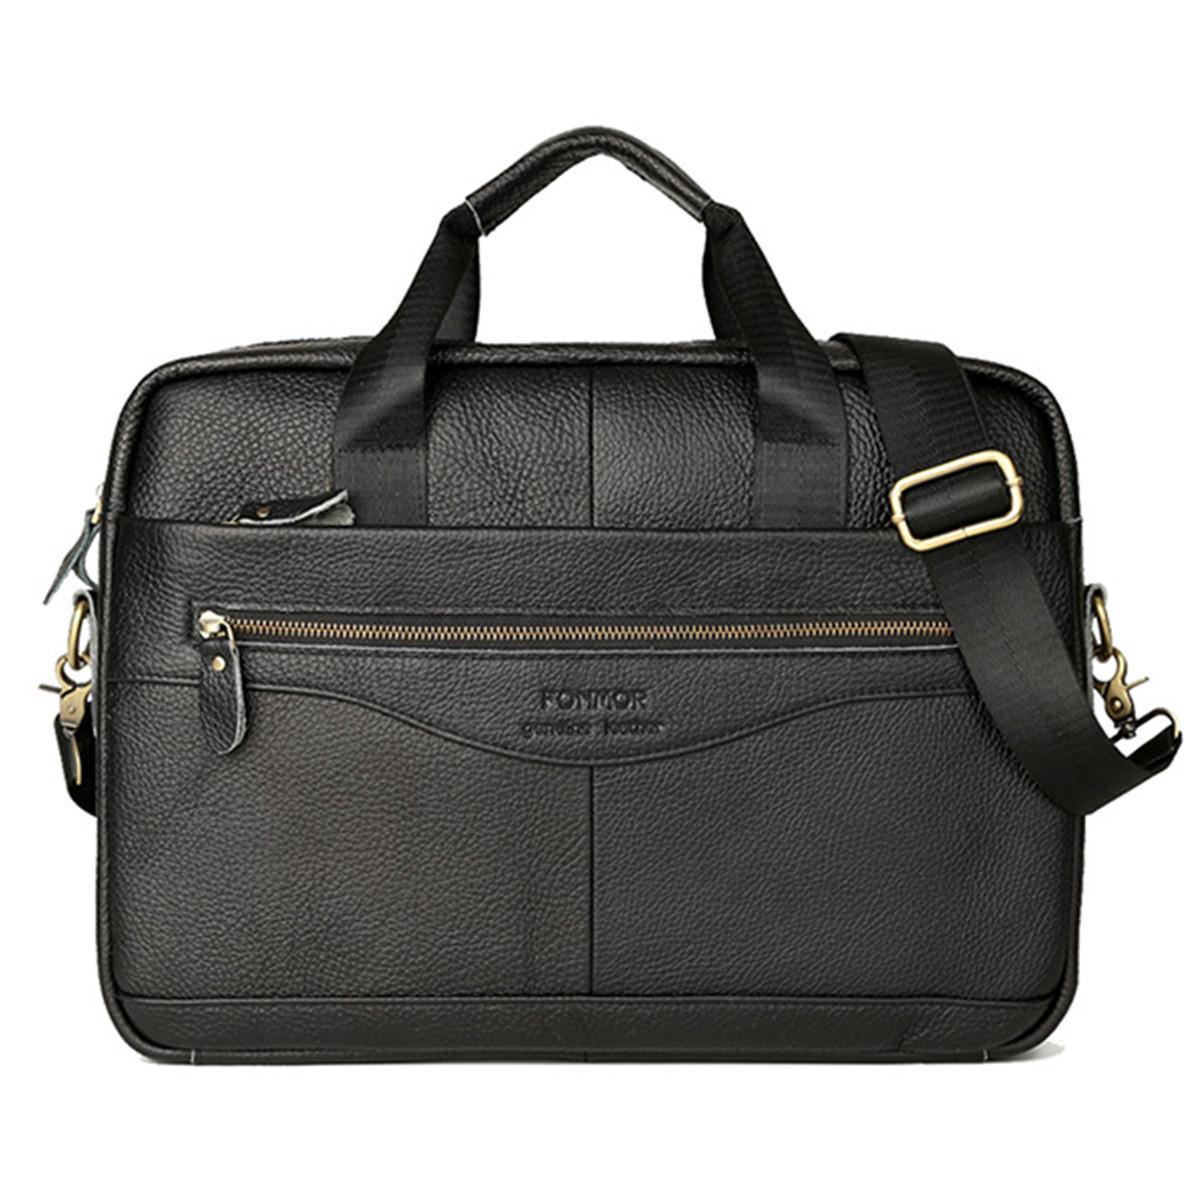 Men-Retro-Genuine-Cow-Leather-Handbag-Business-Briefcase-Messenger-Shoulder-Bag